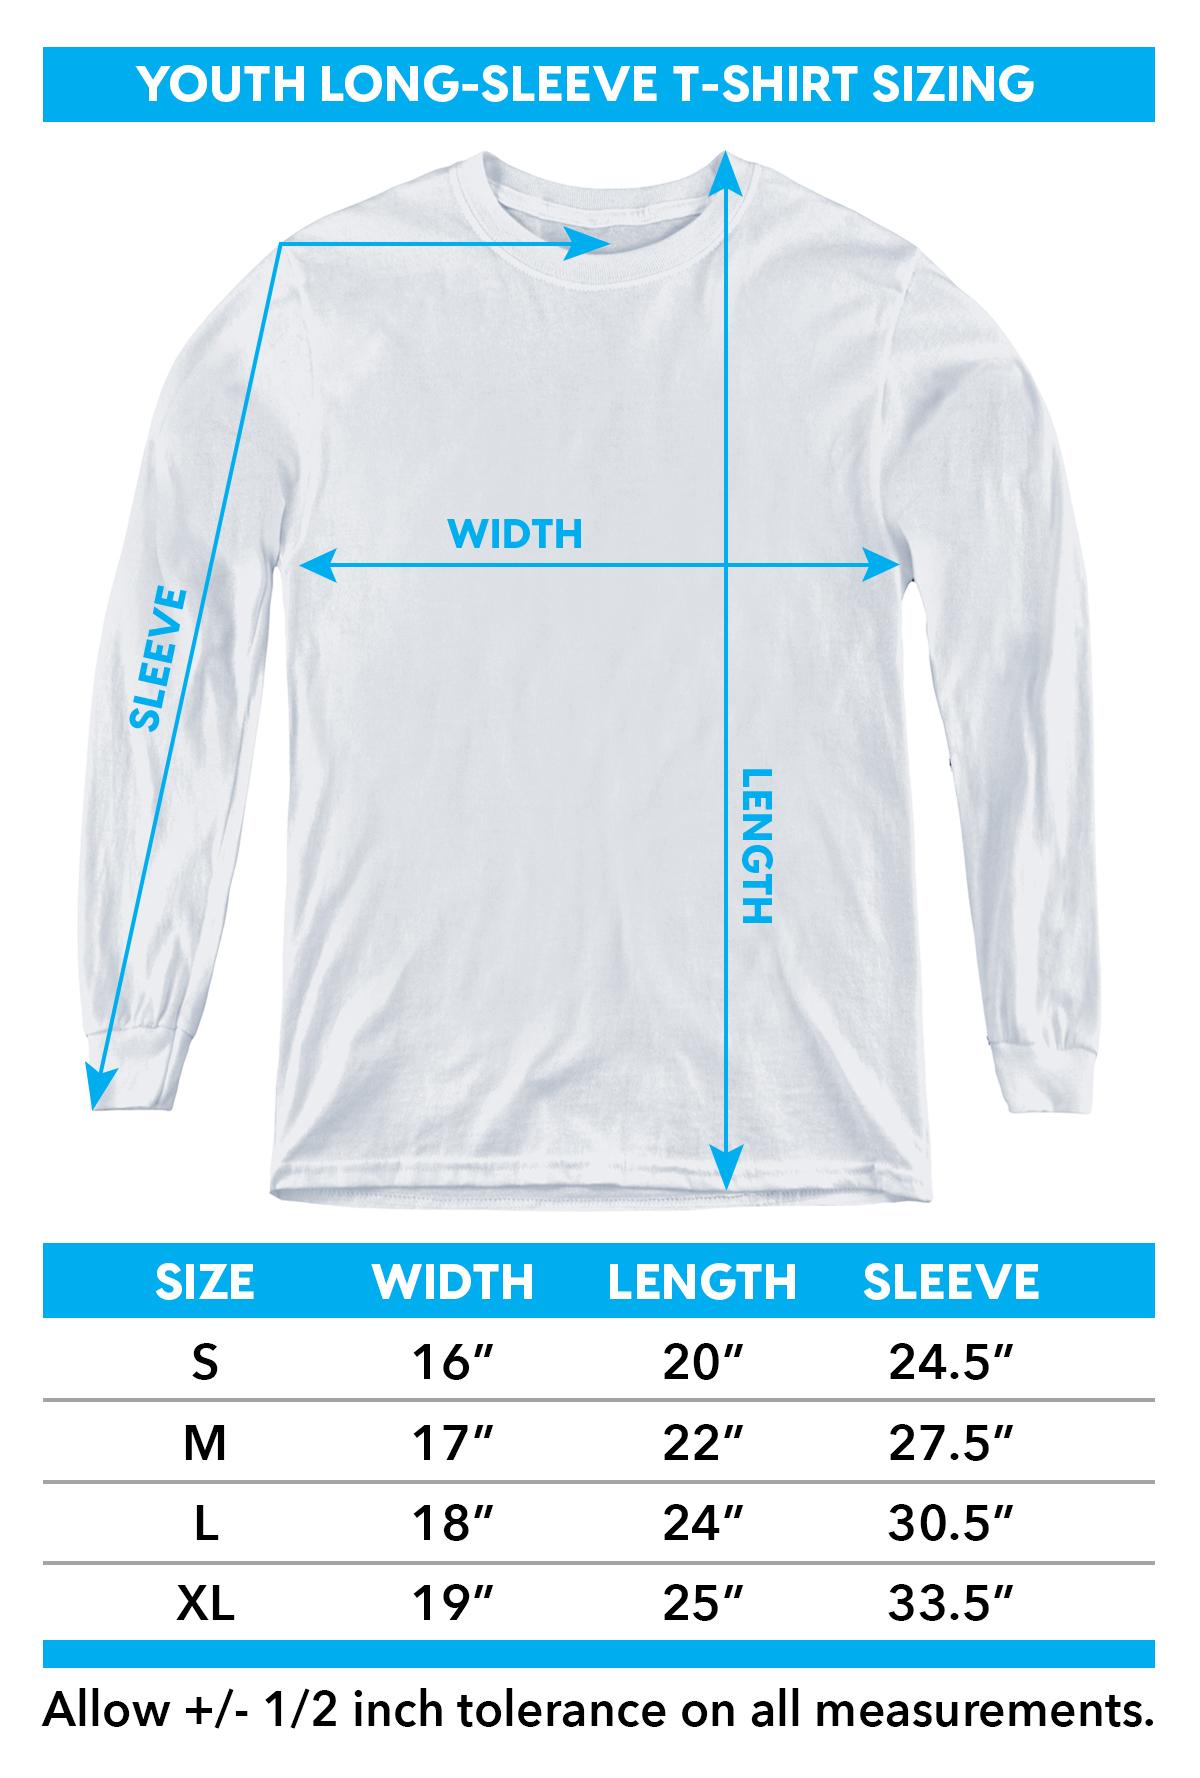 Sizing chart for Batman Youth Long Sleeve T-Shirt - Tie Dye Harley Airbrush TRV-BM2848-YT